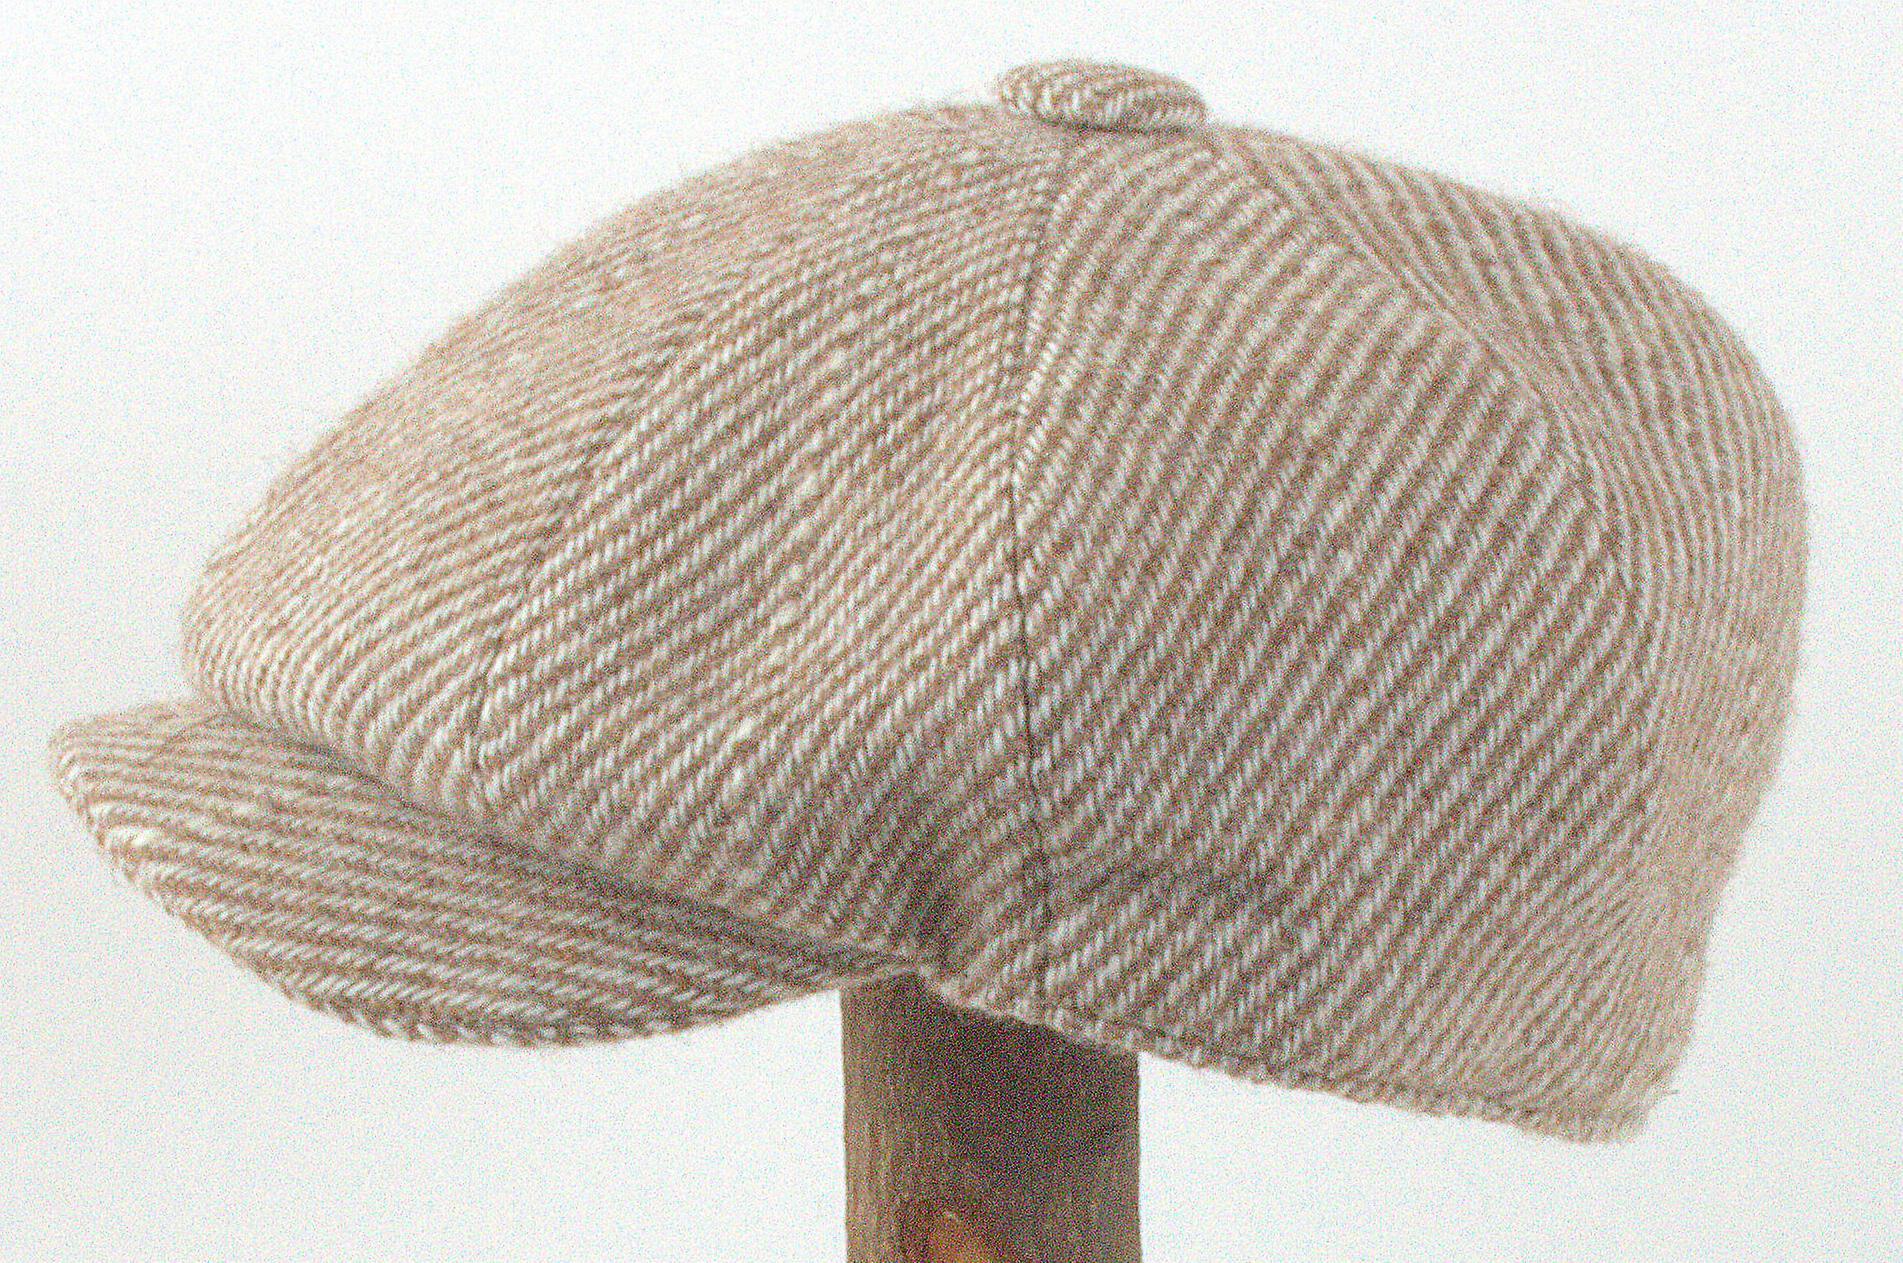 Towton Baker Cap